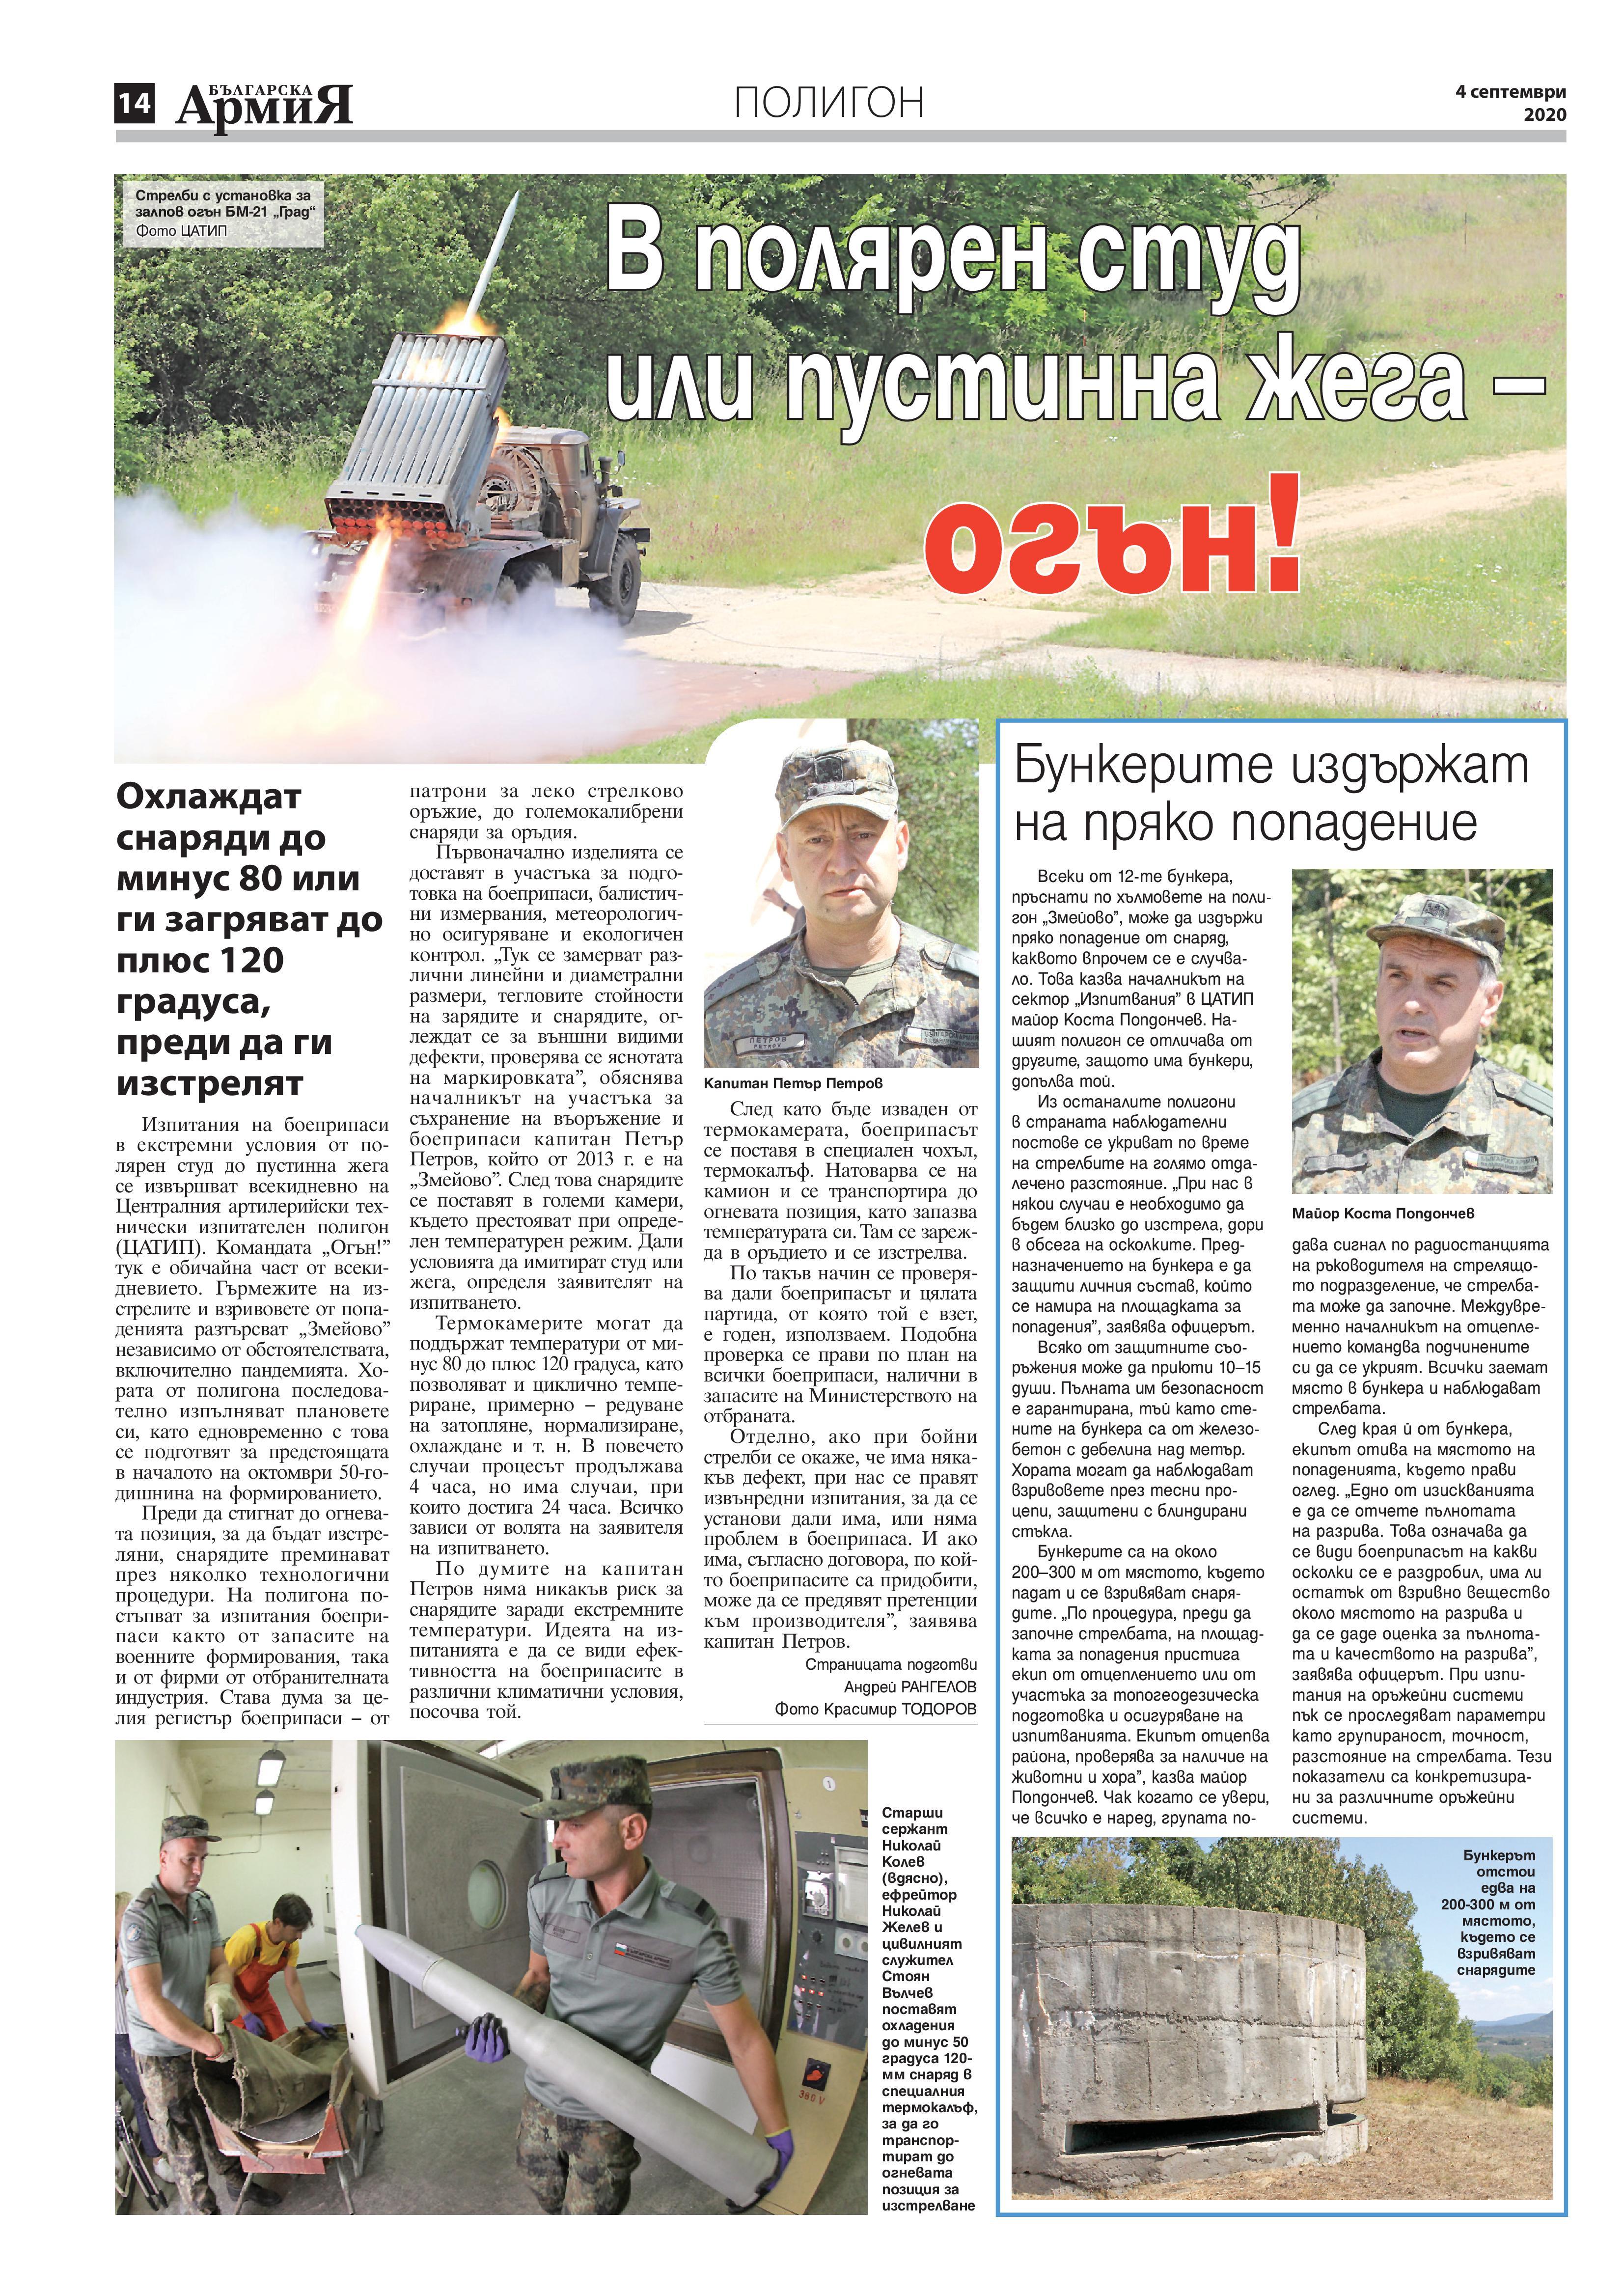 https://www.armymedia.bg/wp-content/uploads/2015/06/14-39.jpg